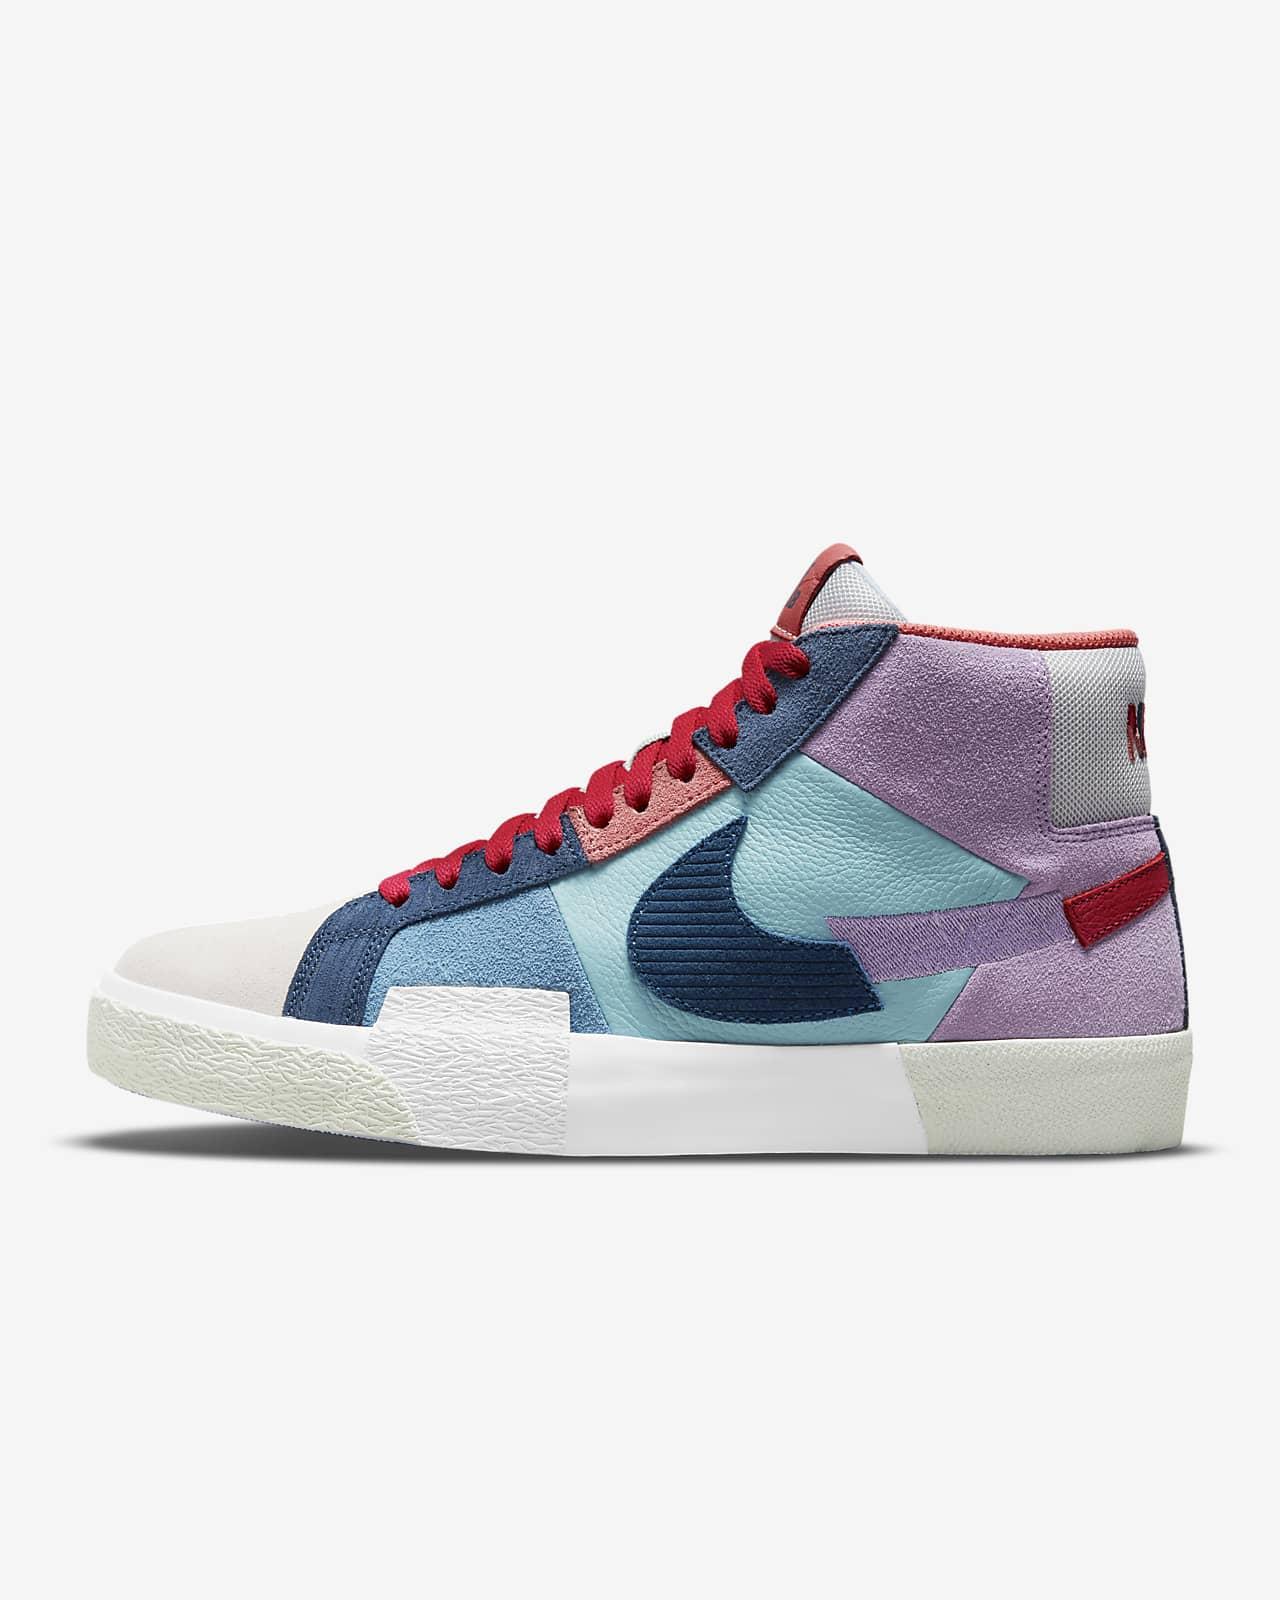 Nike SB Zoom Blazer 中筒 Premium 滑板鞋